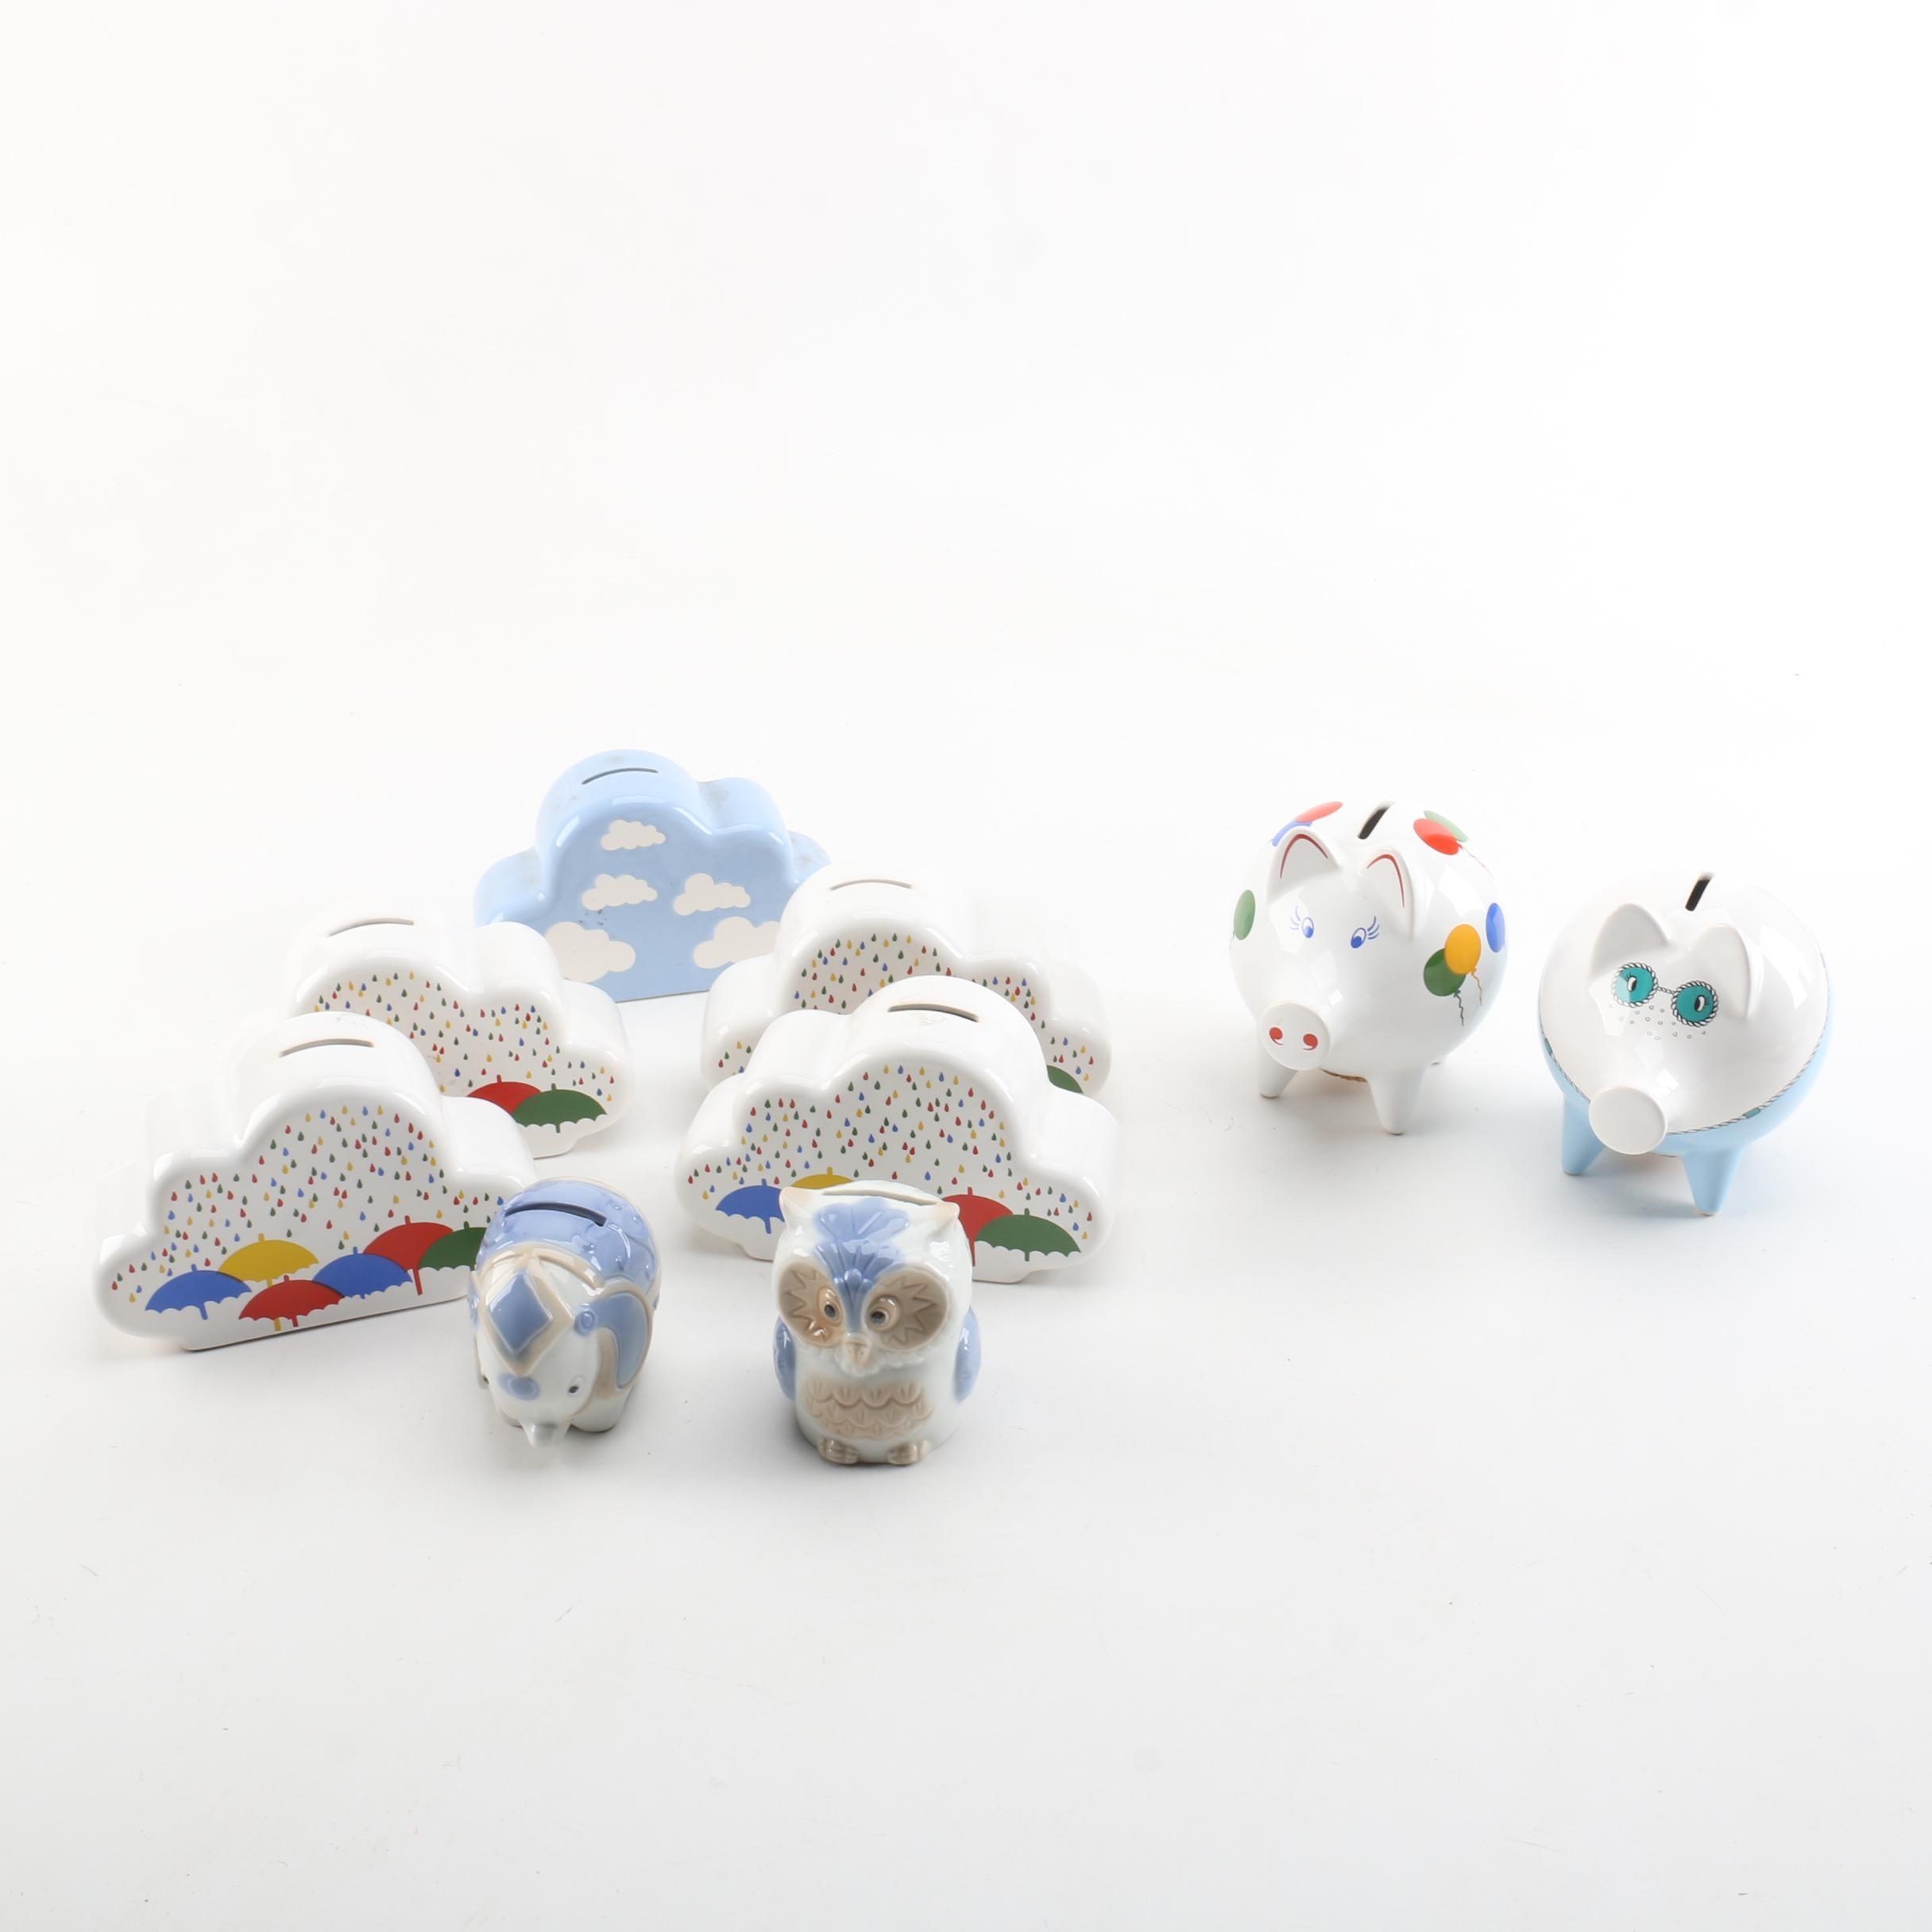 Ceramic Coin and Piggy Banks, Including Waechtersbach